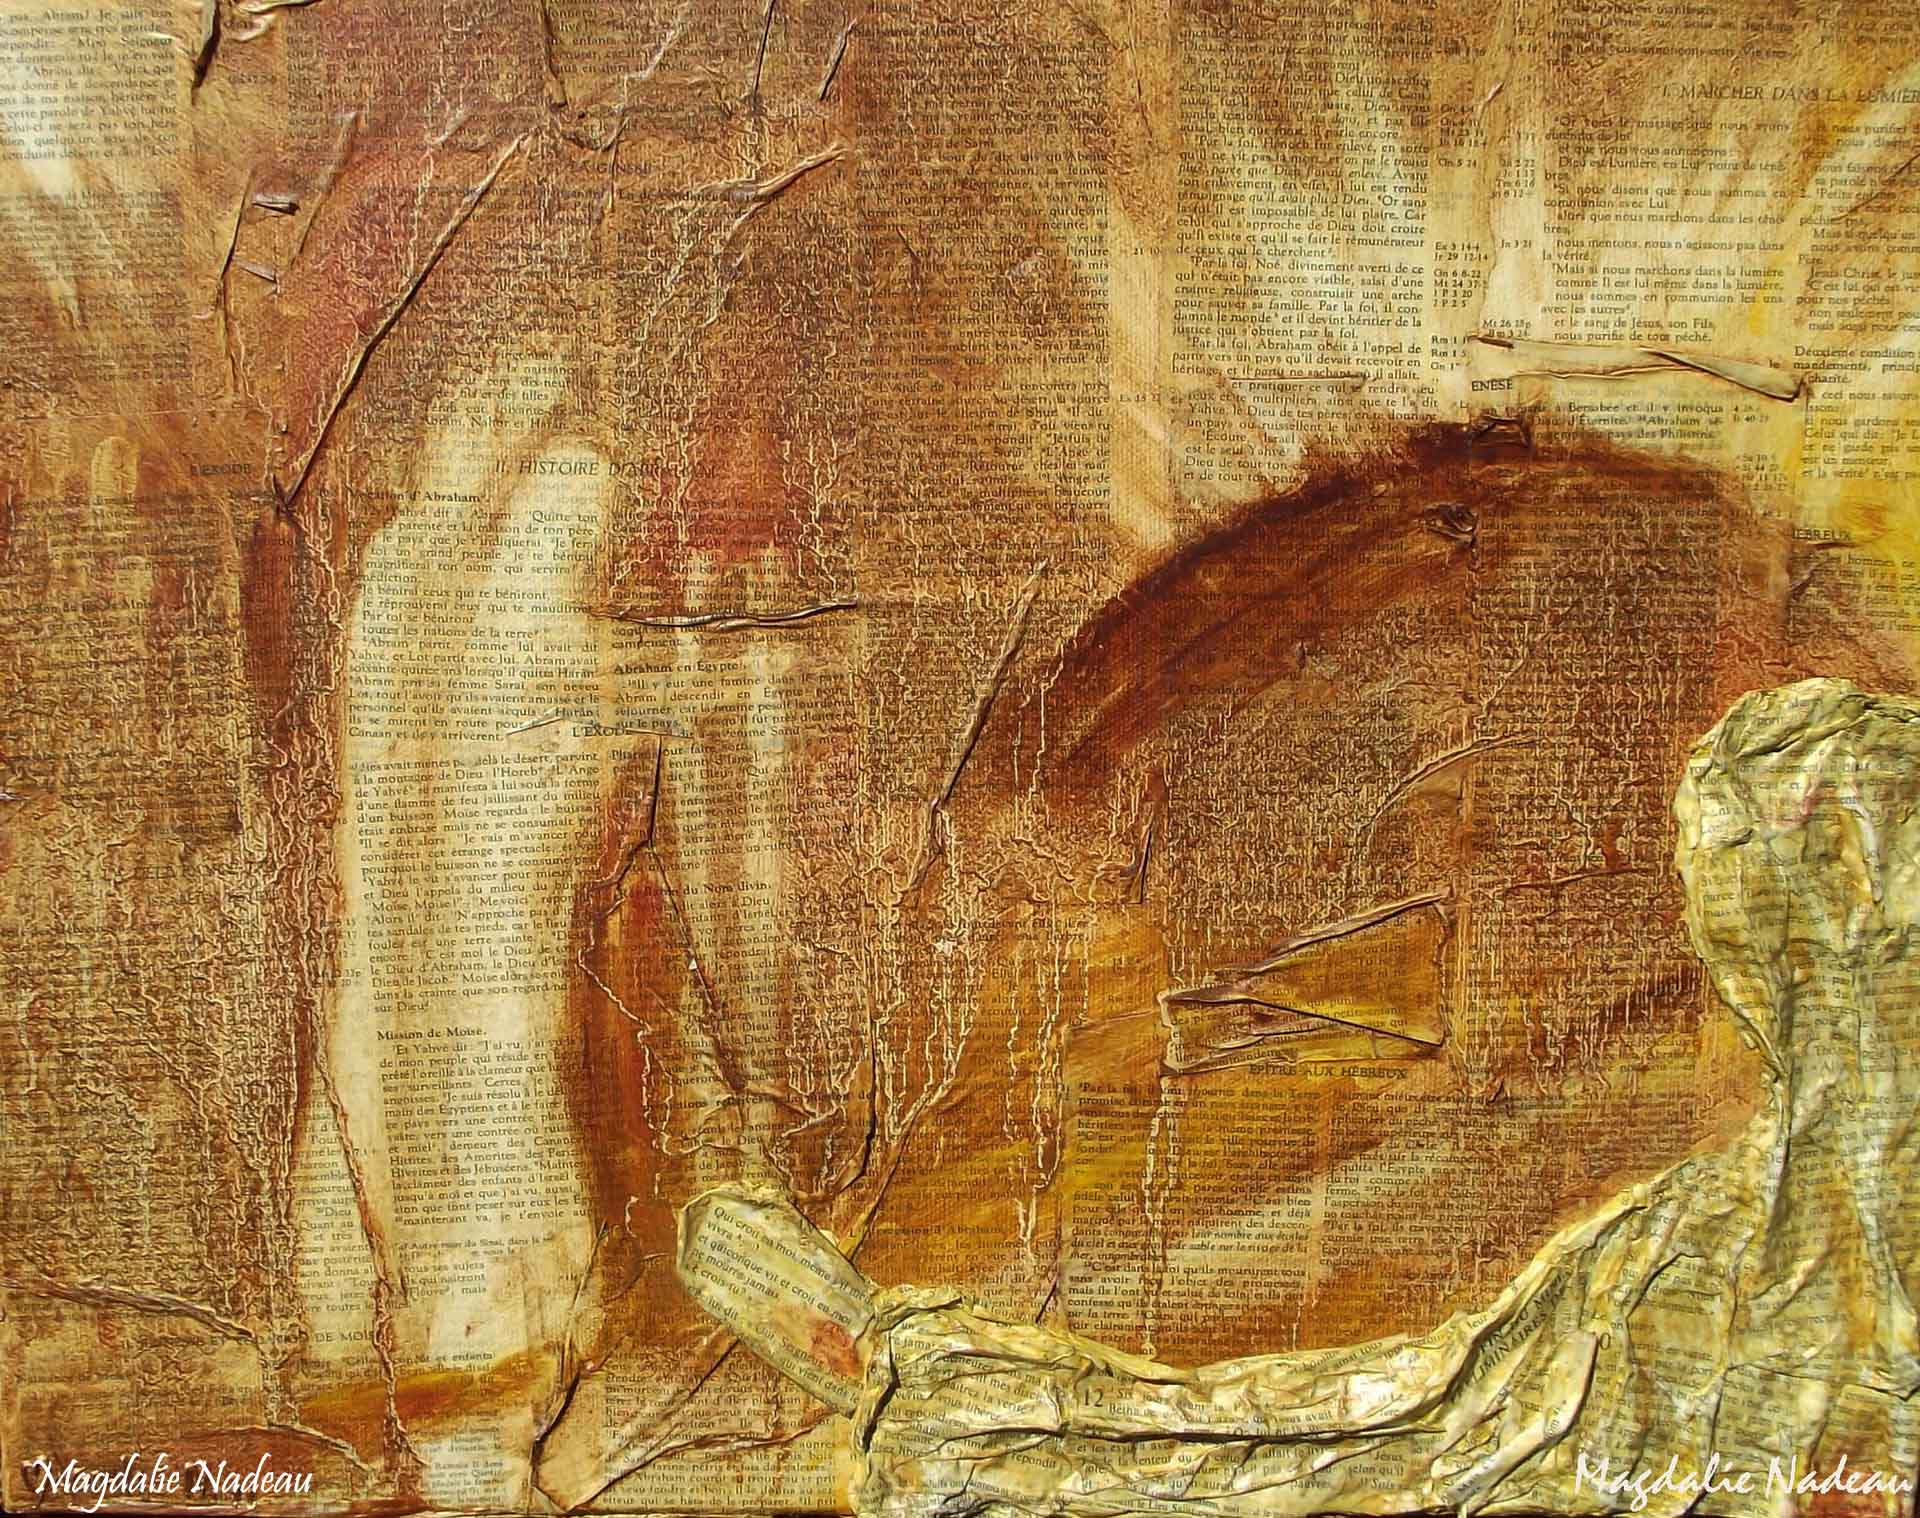 VA EN PÈLERINAGE VERS TA TERRE PROMISE comme Abraham, Moïse, Emmaüs